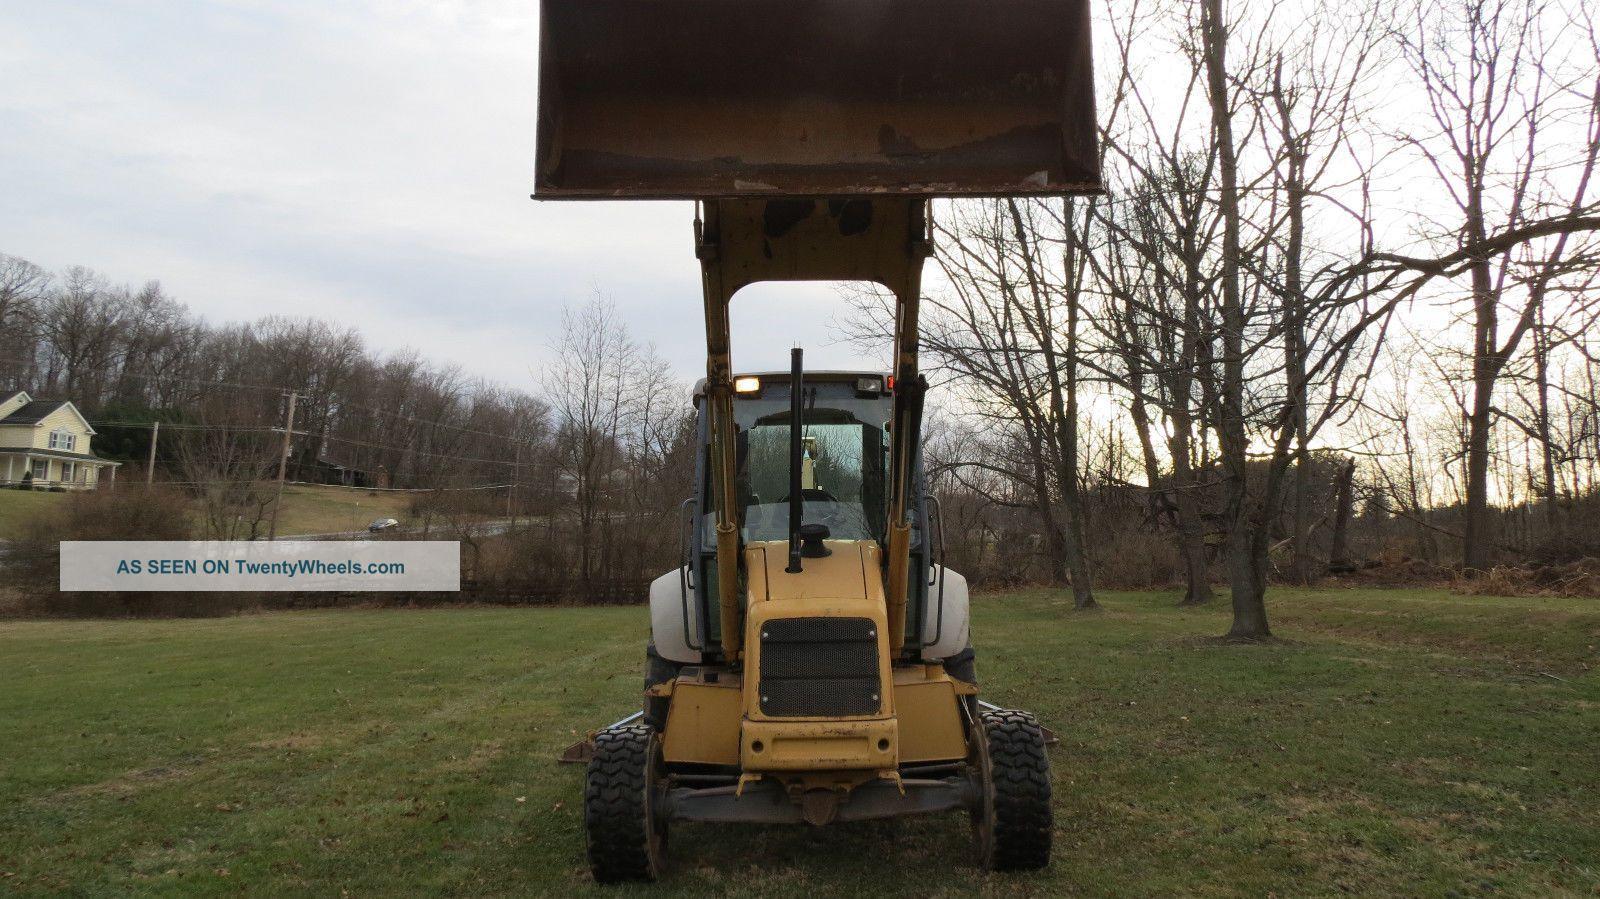 1997 Holland 555e 4x4 Tractor Loader Backhoe Cab W/ Heat 83hp Diesel Backhoe Loaders photo